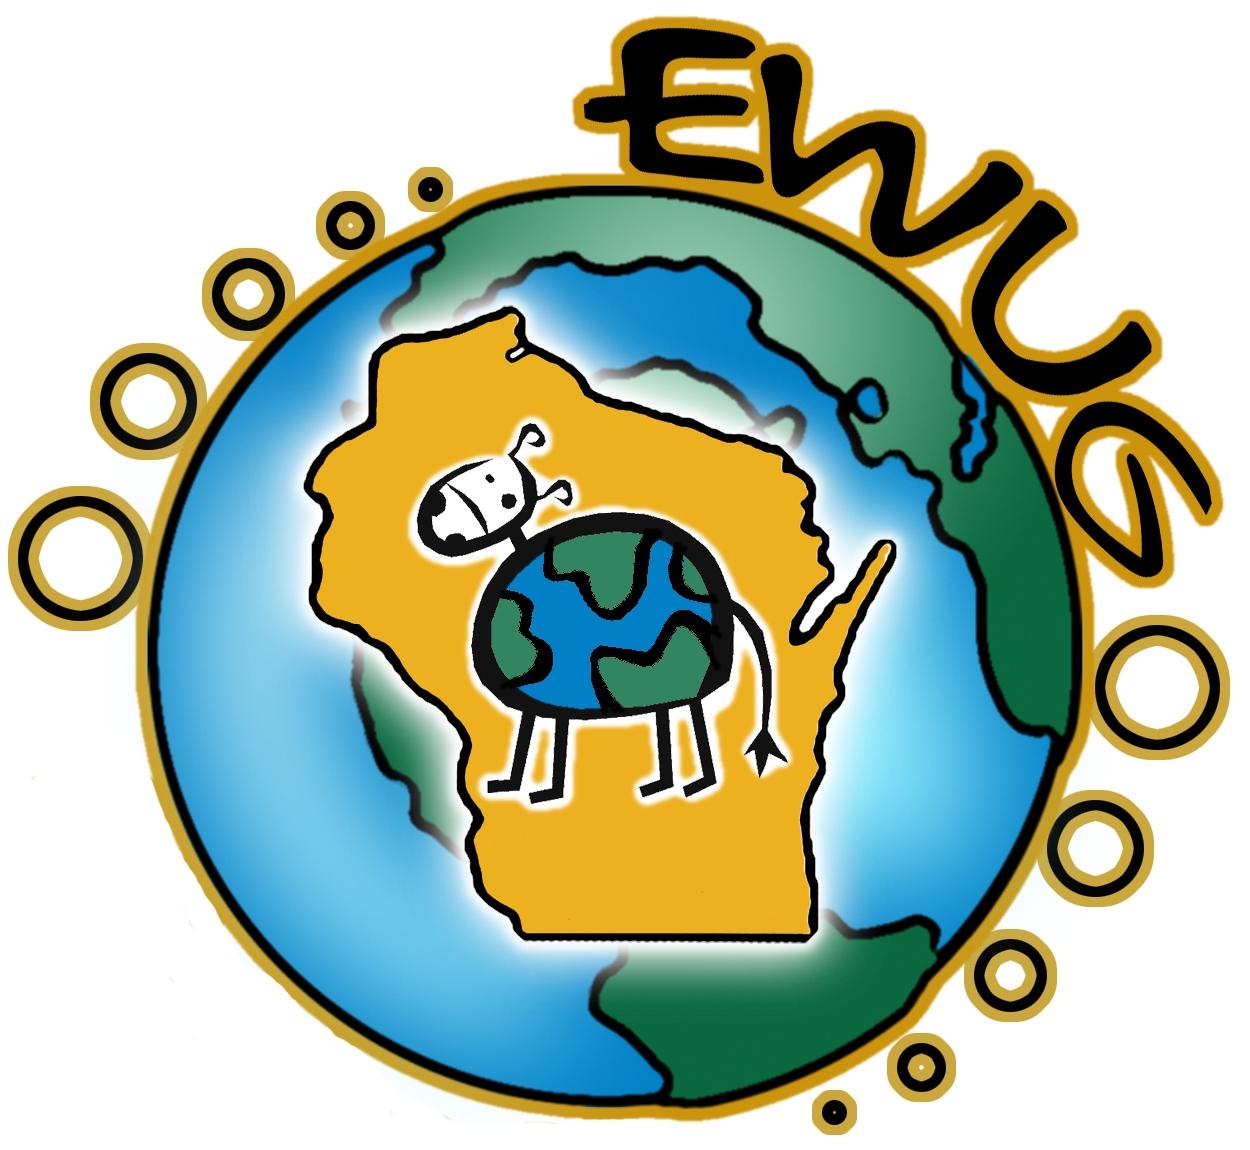 EWUG logo